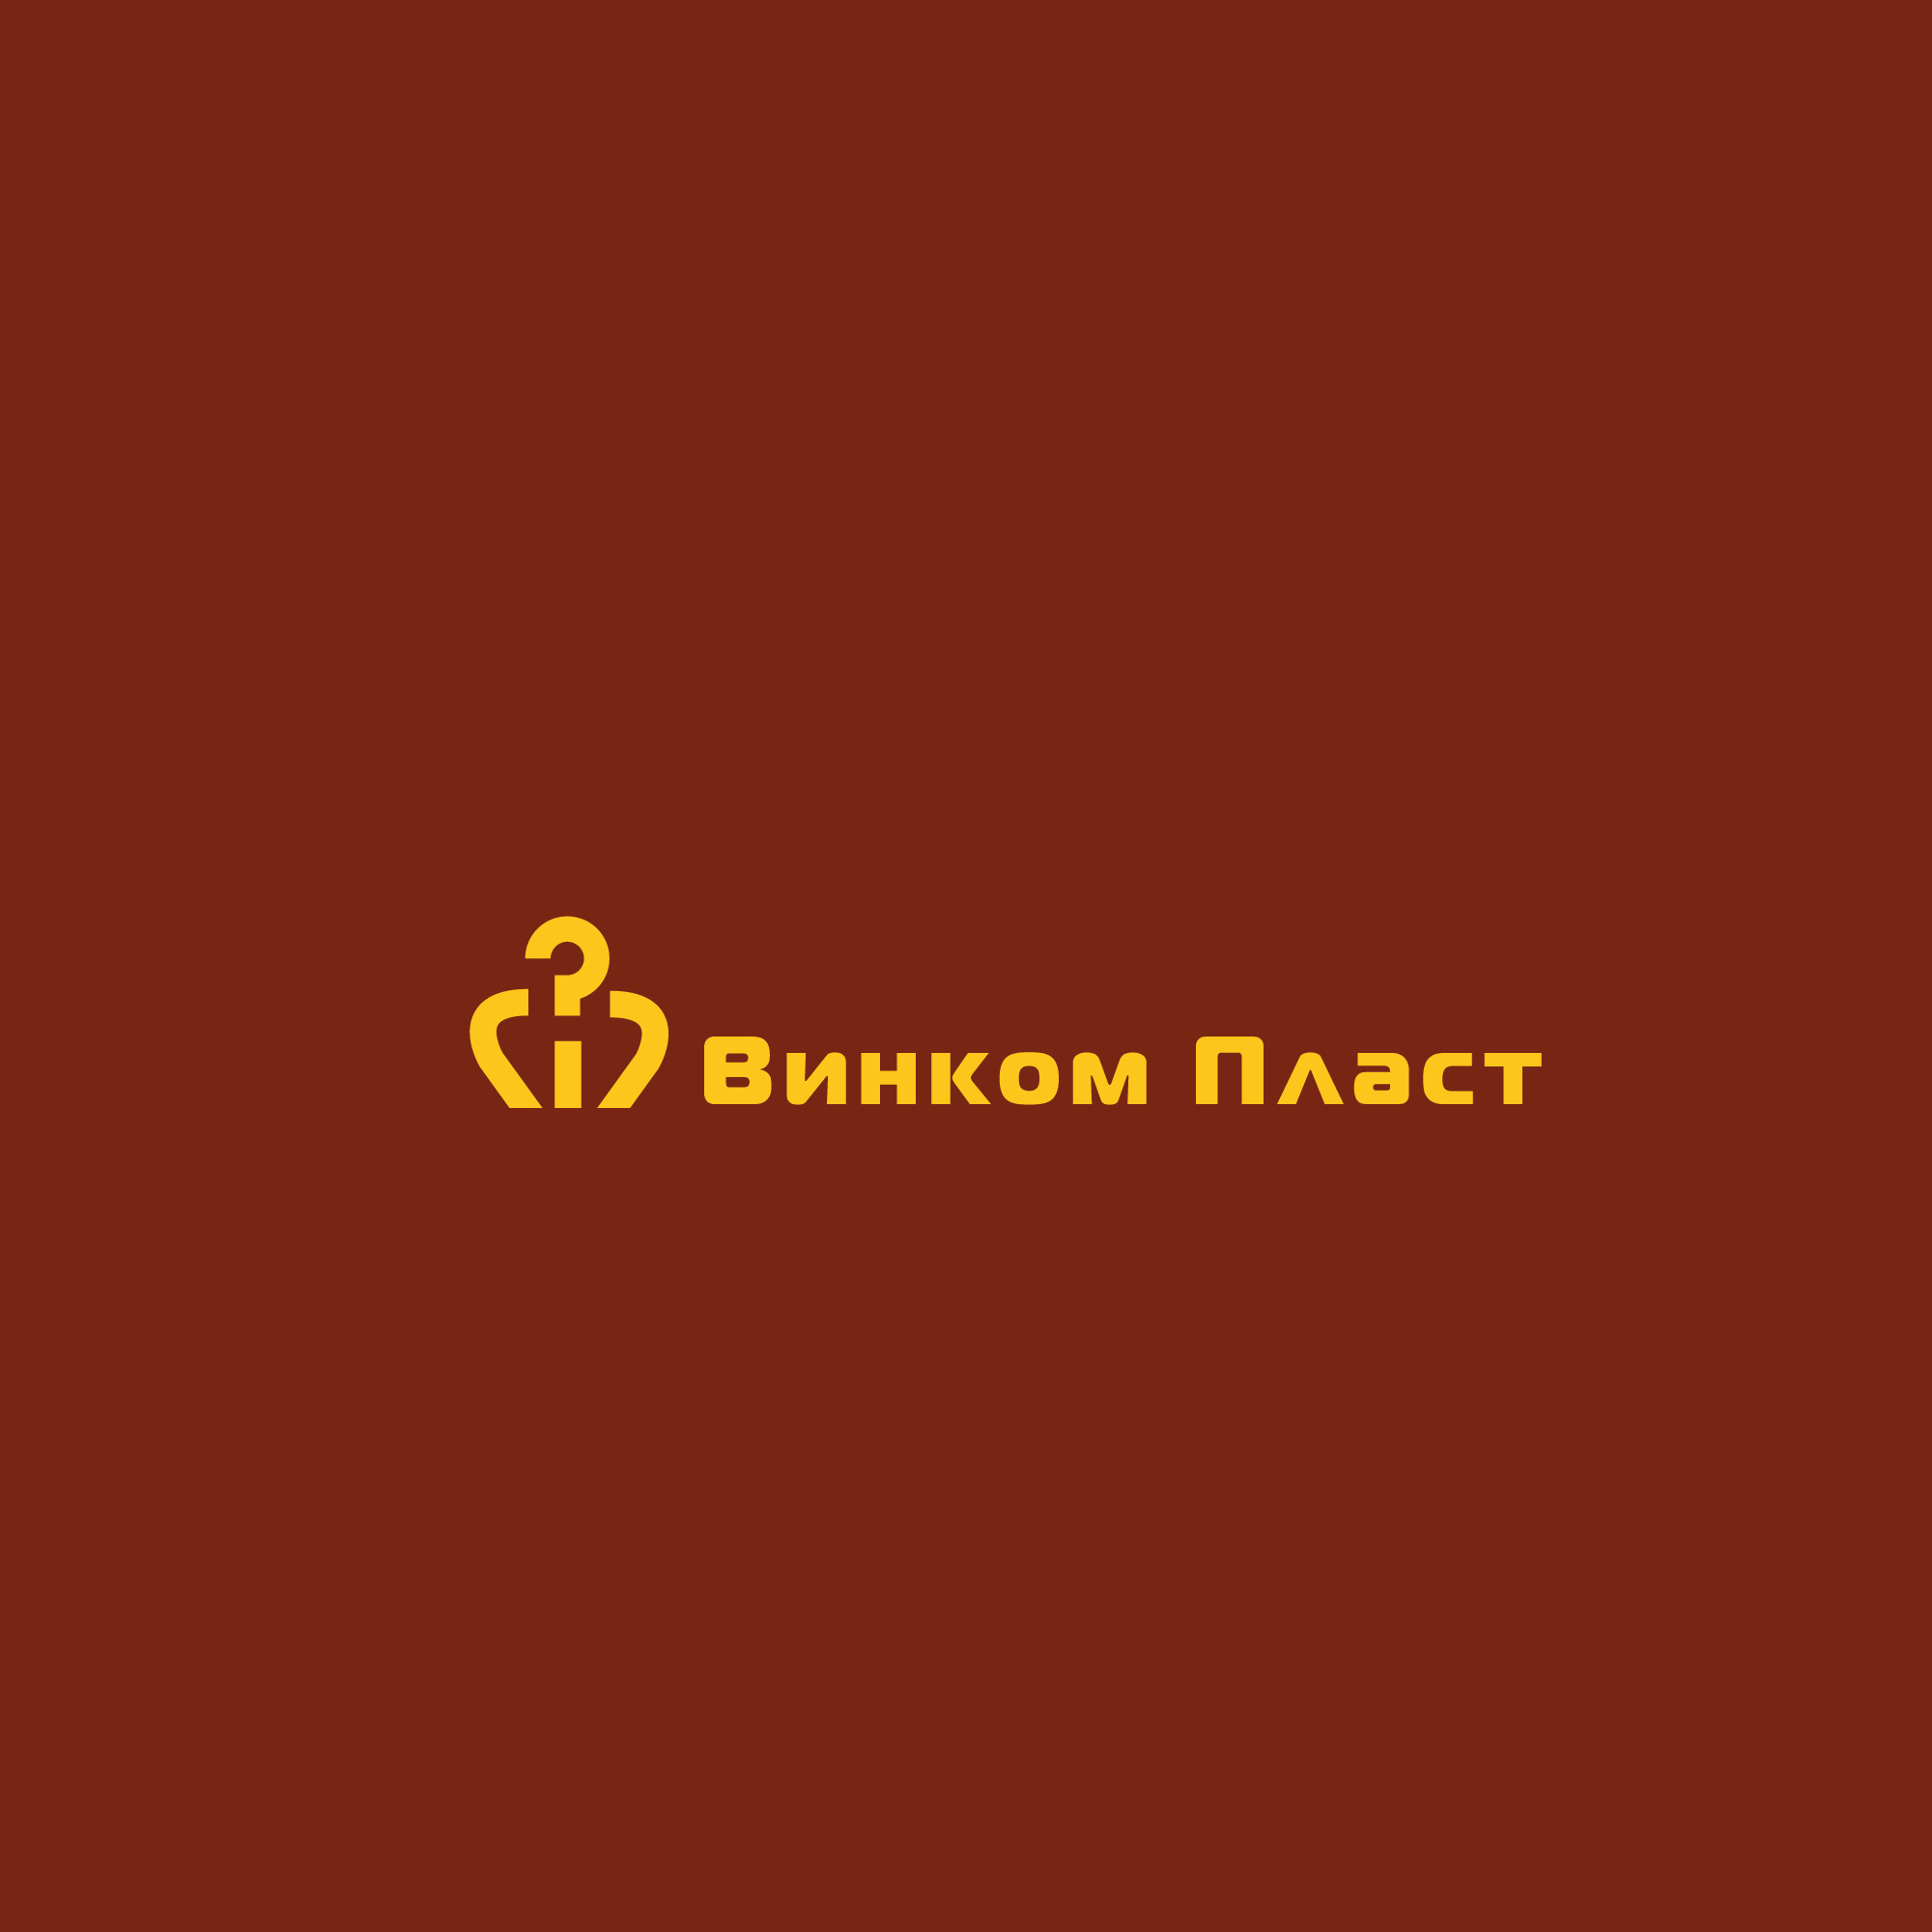 Логотип, фавикон и визитка для компании Винком Пласт  фото f_7445c3d7d57d7acf.jpg